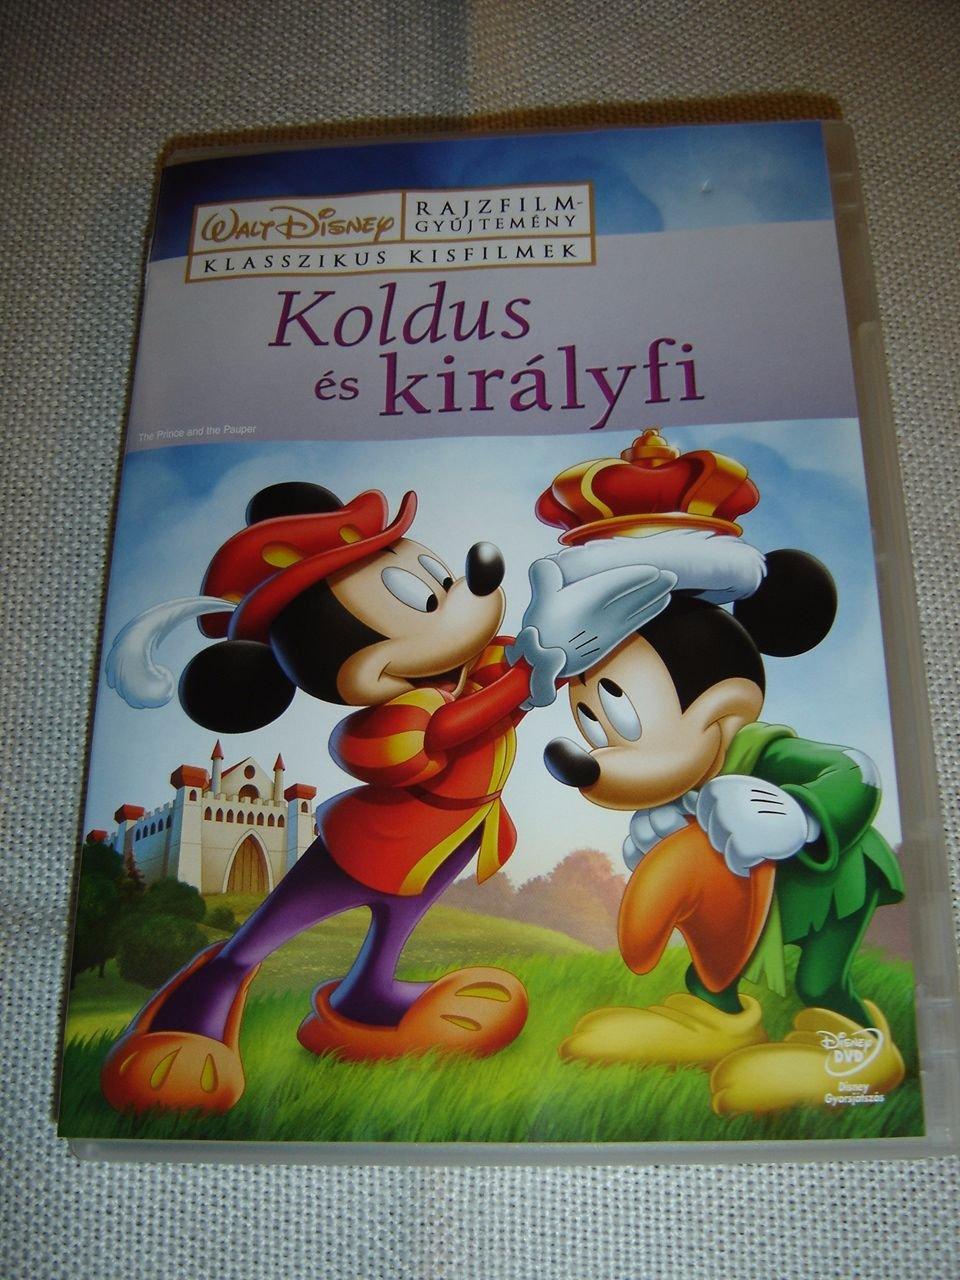 1b16cad8b6a Koldus és királyfi / The Prince and the Pauper / English, Hungarian,  Portuguese, Polish, Greek, Turkish, Arabic, Romanian SOUND and SUBTITLES  [European DVD ...